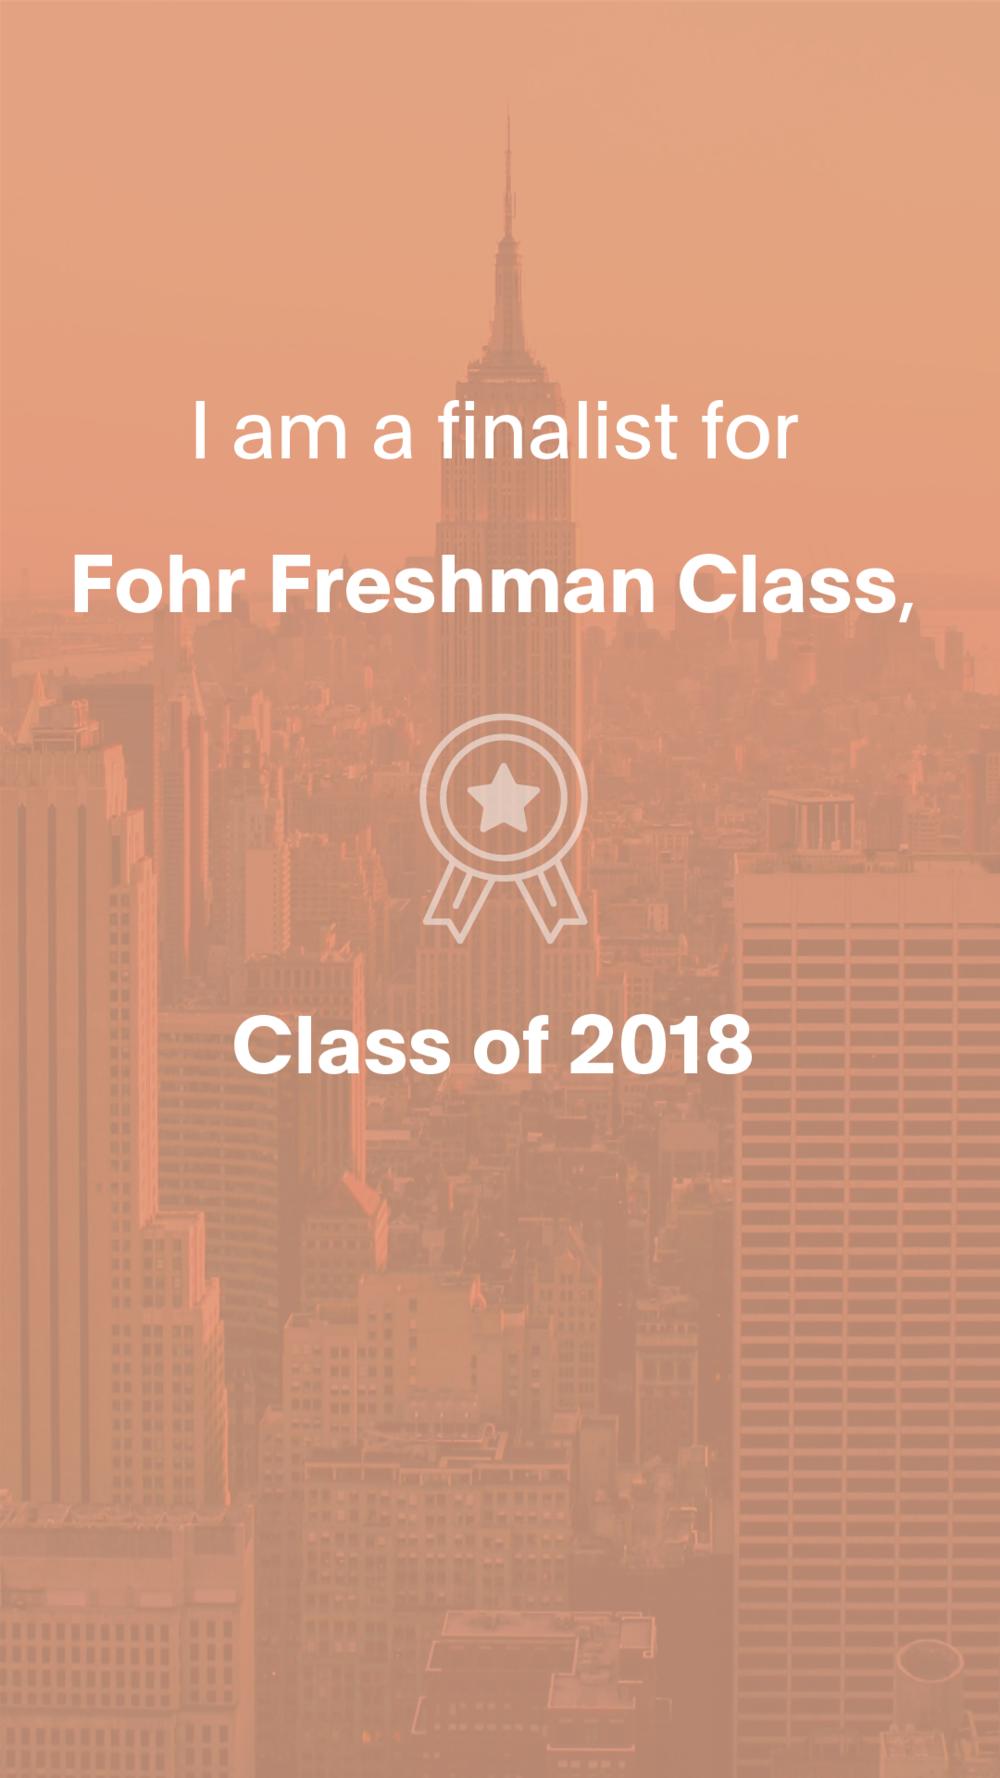 freshman Class finalists_updated-01.png